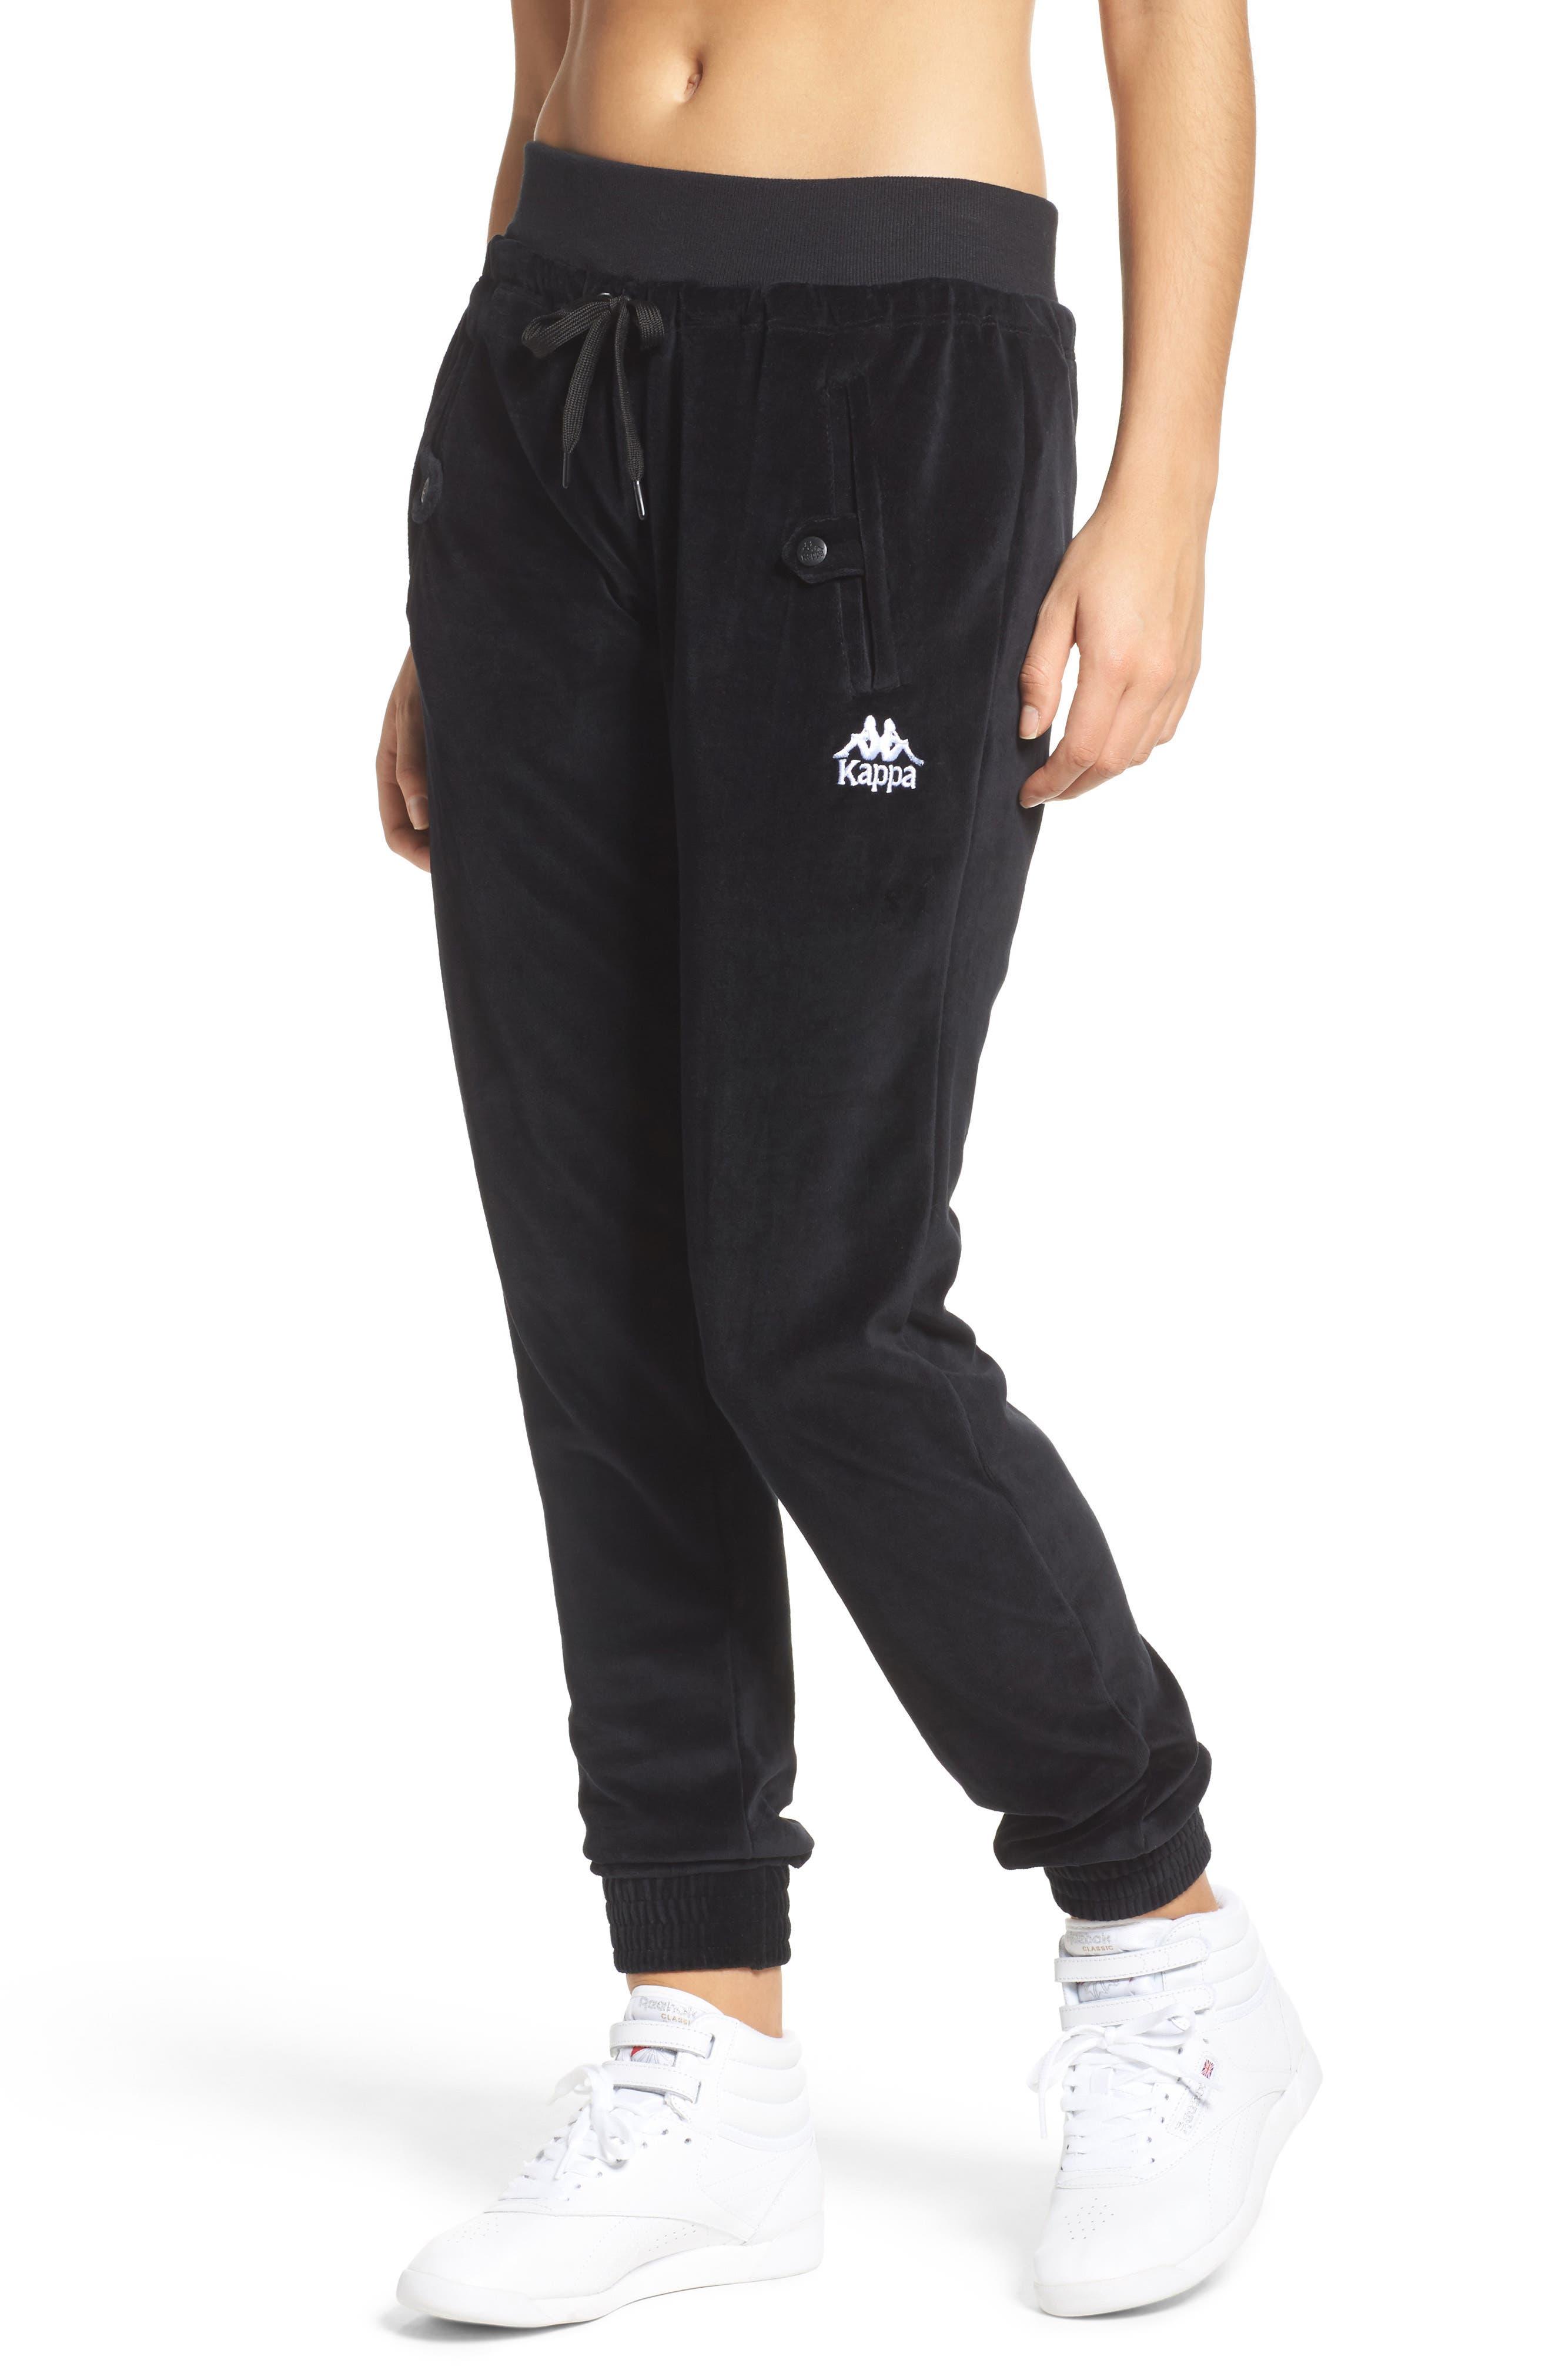 KAPPA Authentic Screwball Track Pants